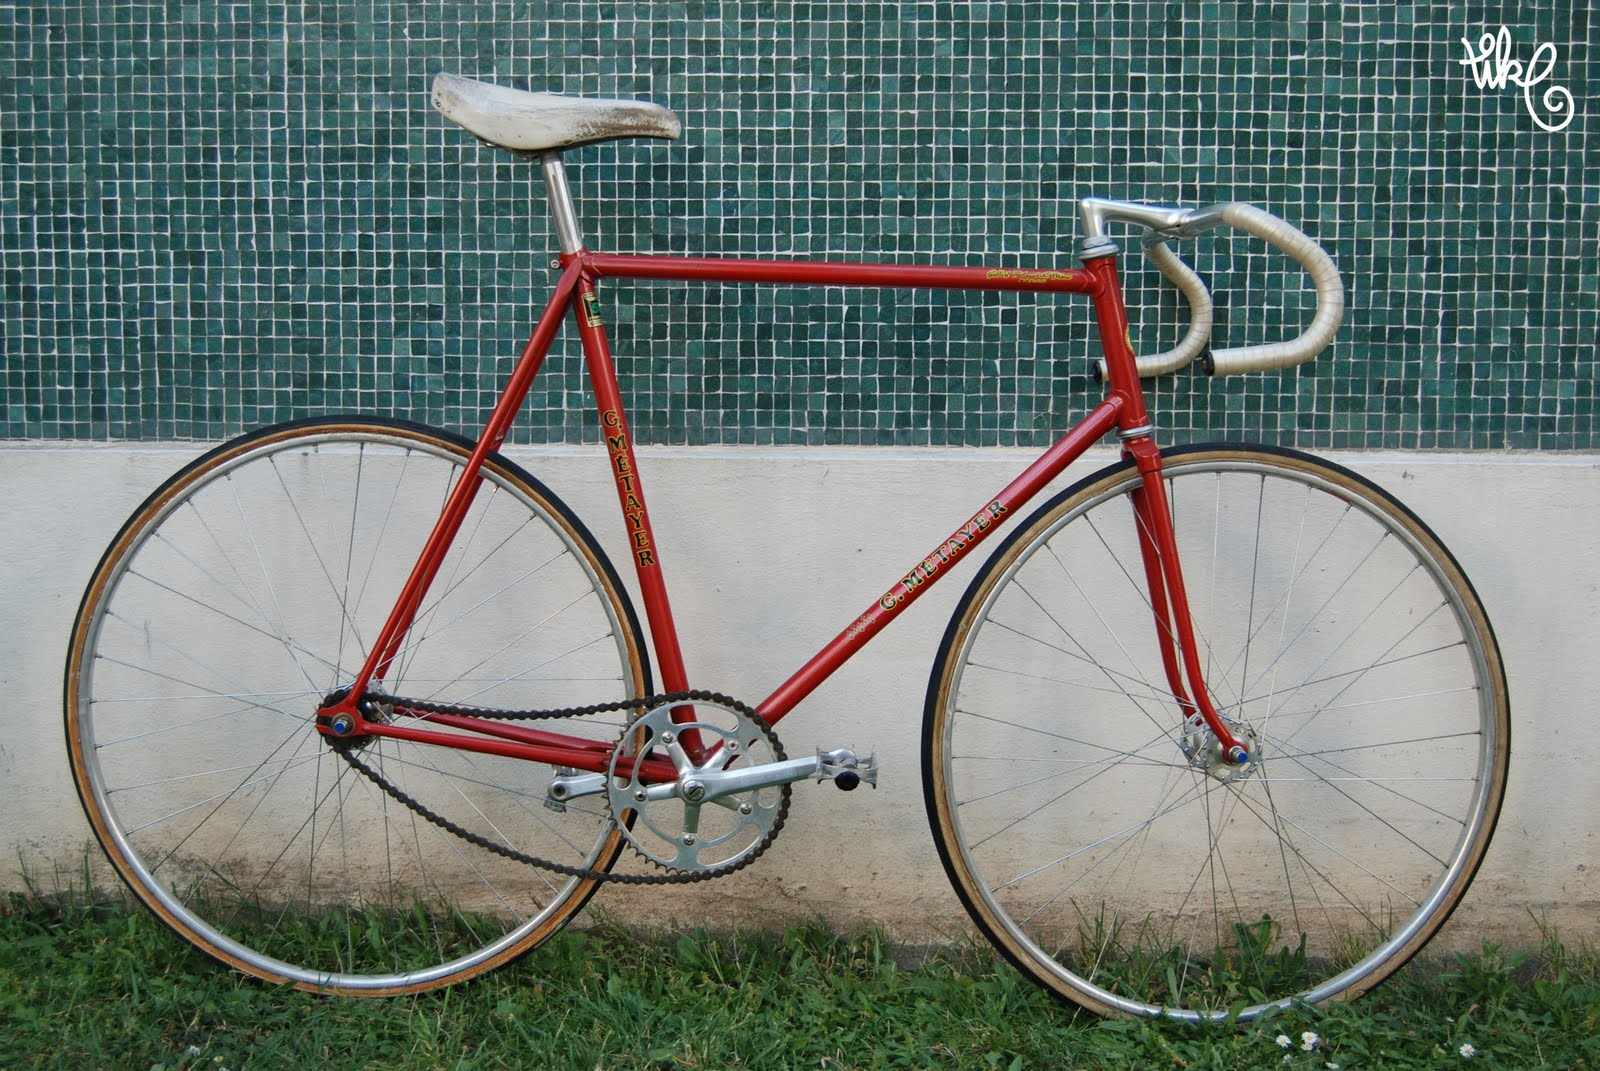 Tike Sales Track Bike Gitane Mexico In Reynolds 531 Rebadged G